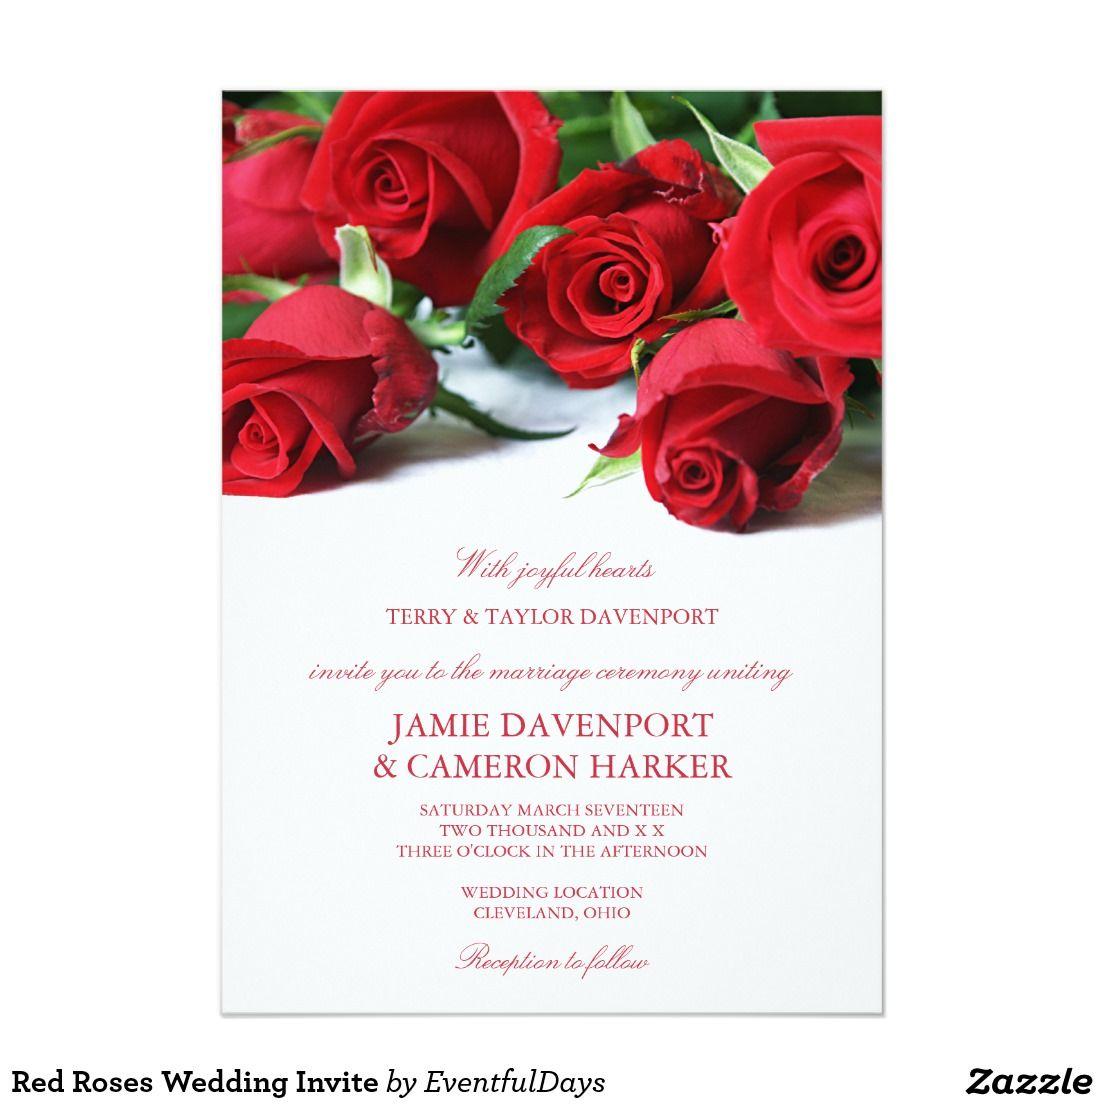 Red Roses Wedding Invite | Wedding Floral Invites | Pinterest | Rose ...